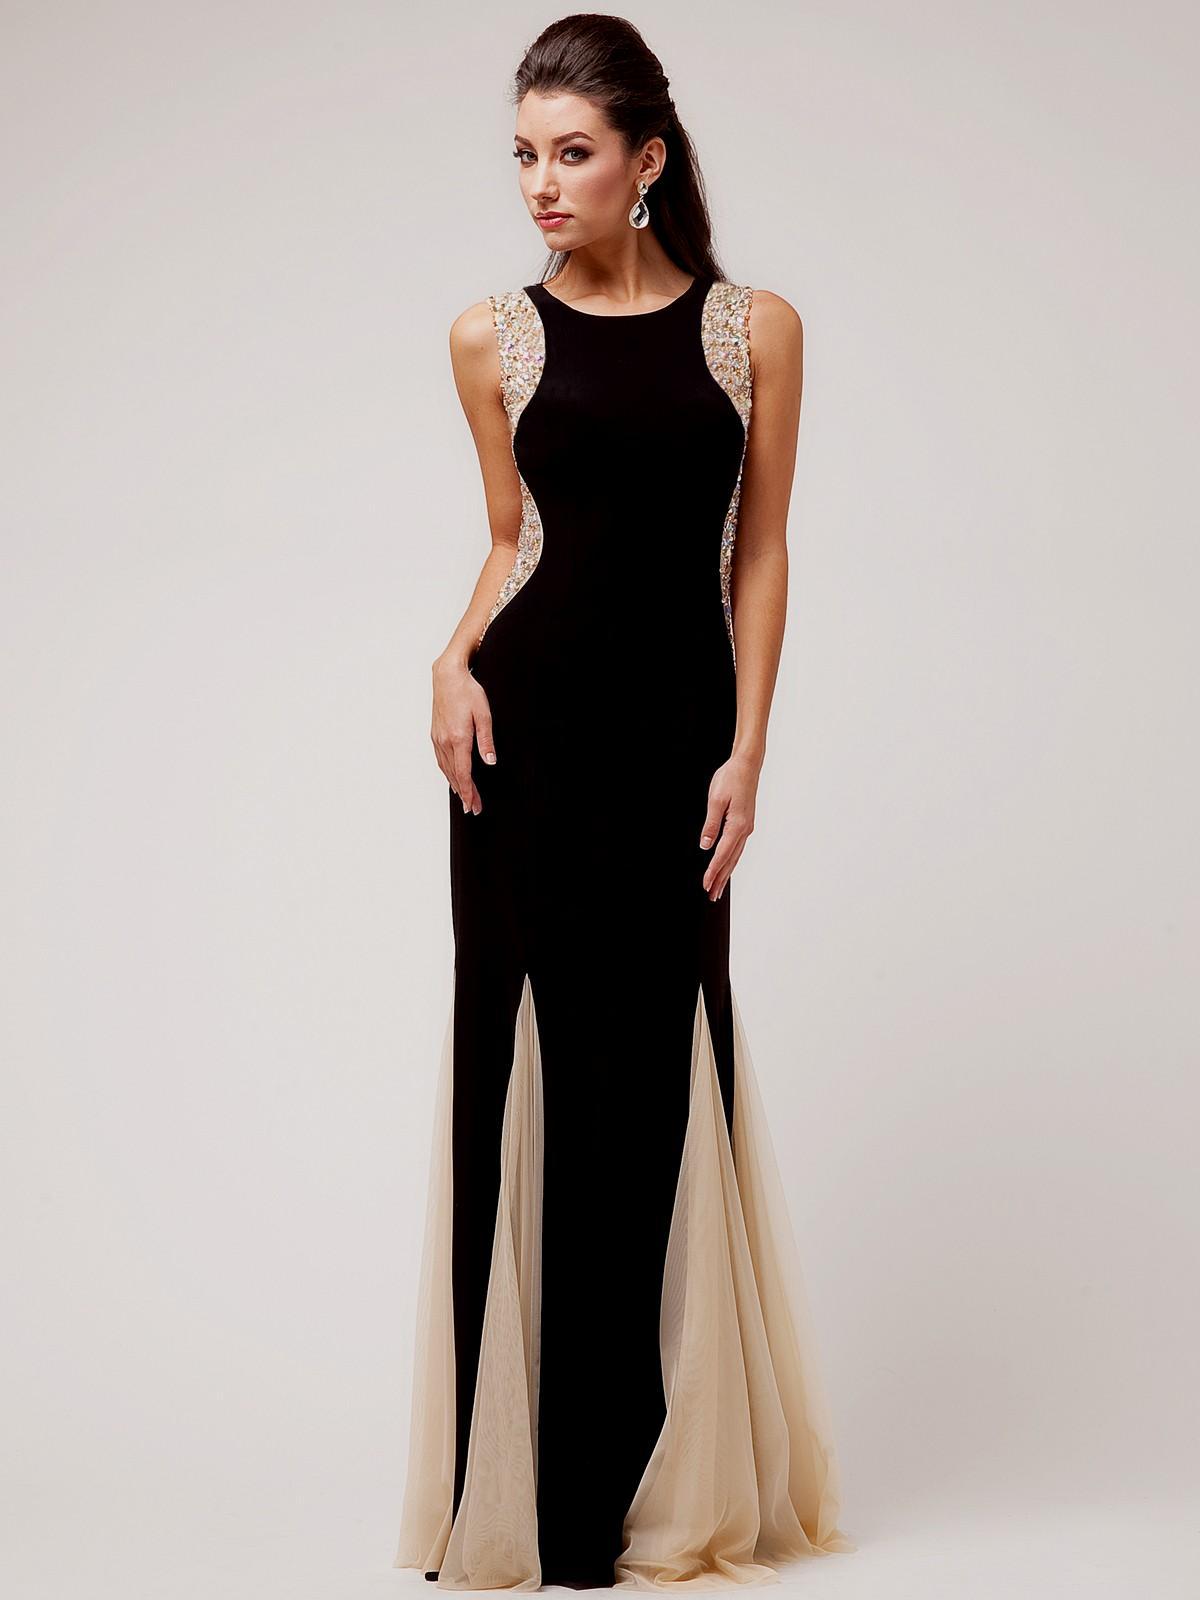 black and white elegant dresses photo - 1